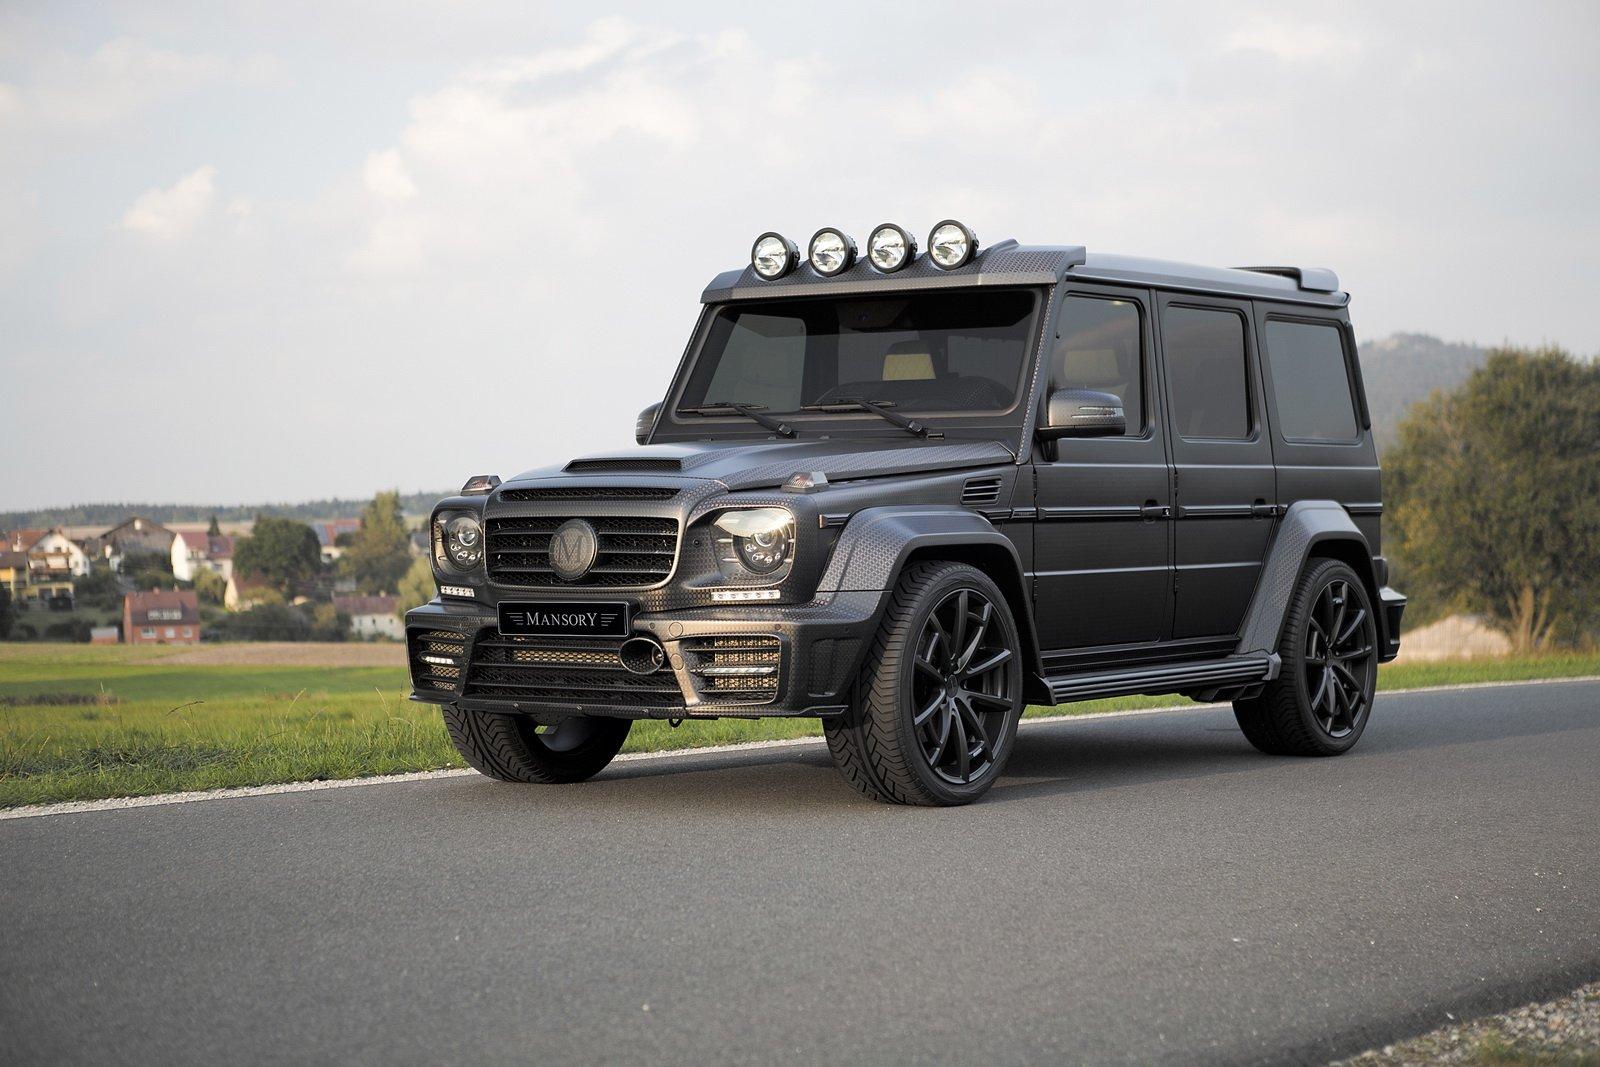 mansory mercedes g63 amg gronos black edition cars 4x4. Black Bedroom Furniture Sets. Home Design Ideas